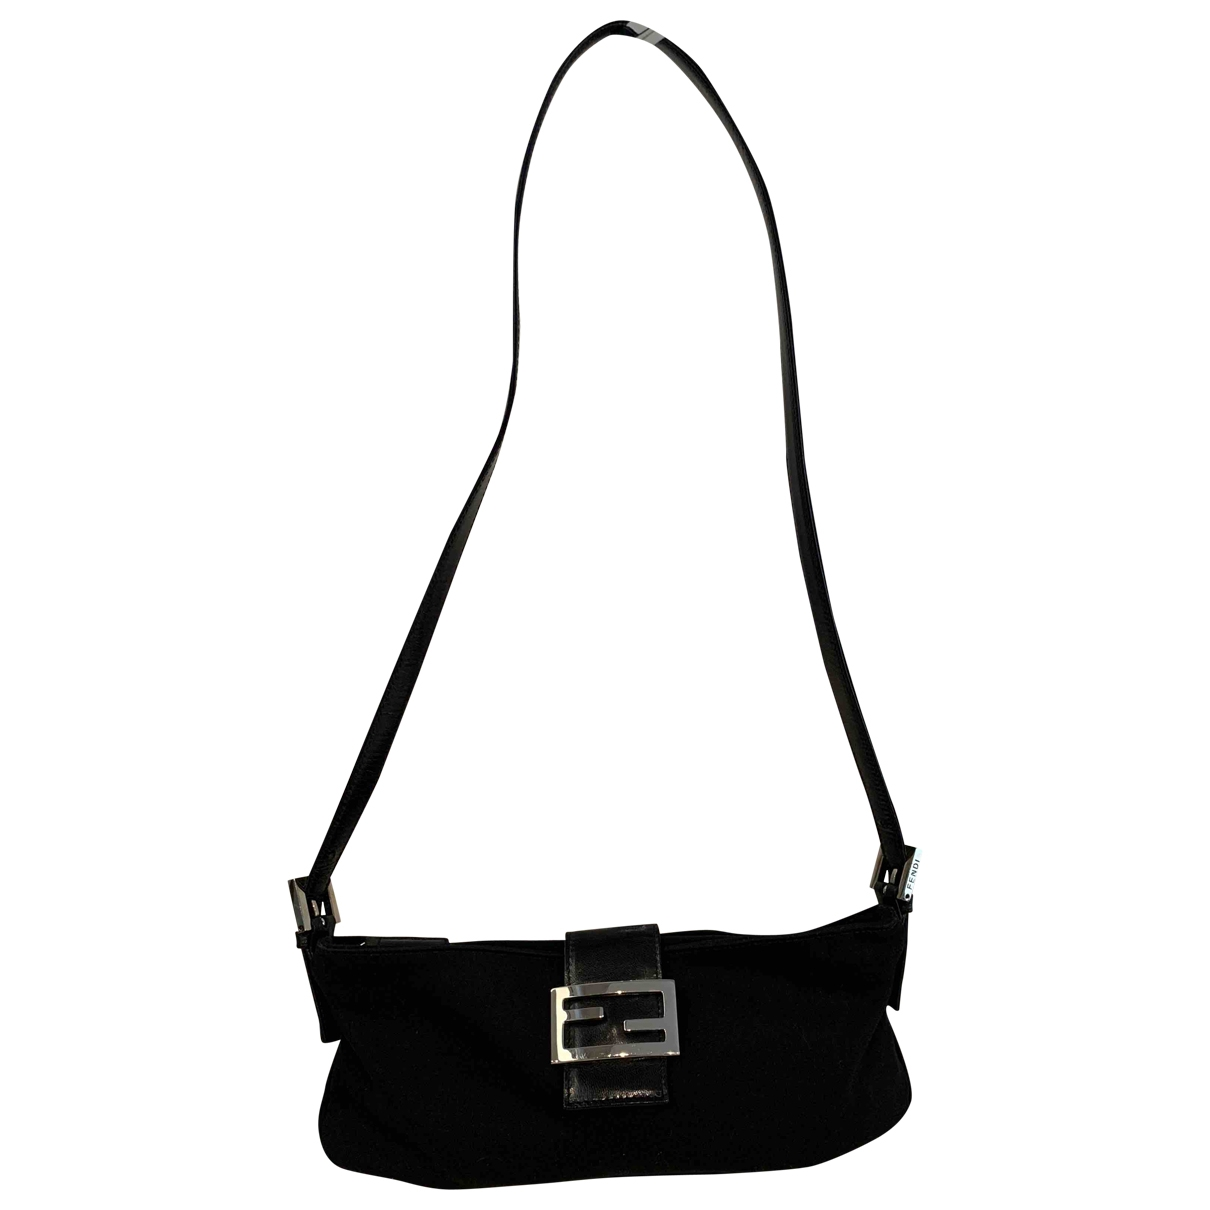 Fendi Baguette Handtasche in  Schwarz Leinen